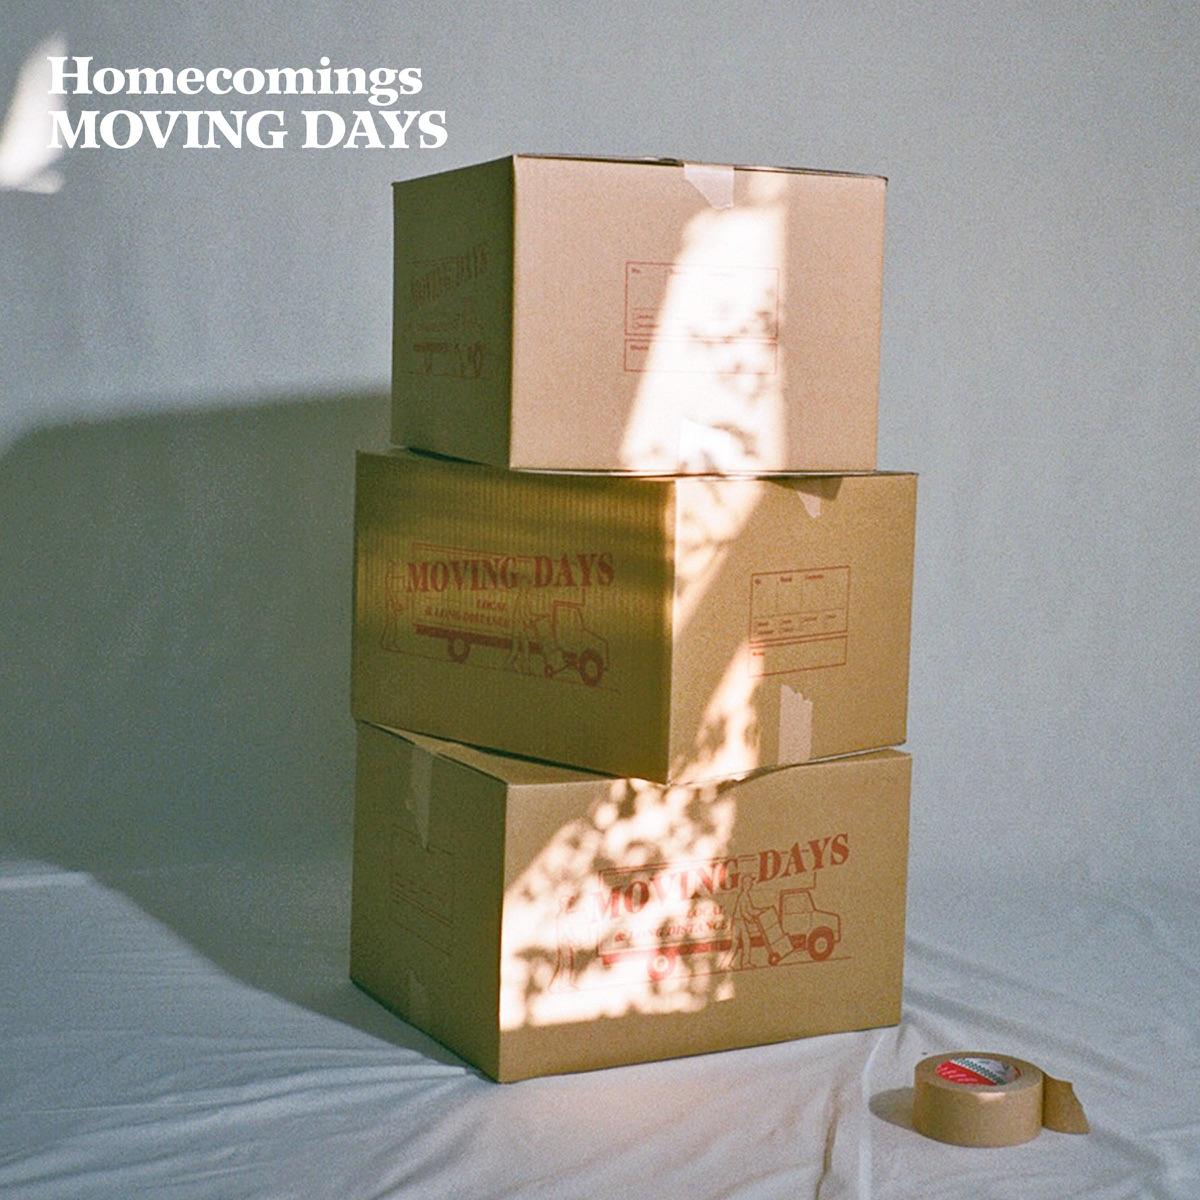 『Homecomings - Here』収録の『MOVING DAYS』ジャケット